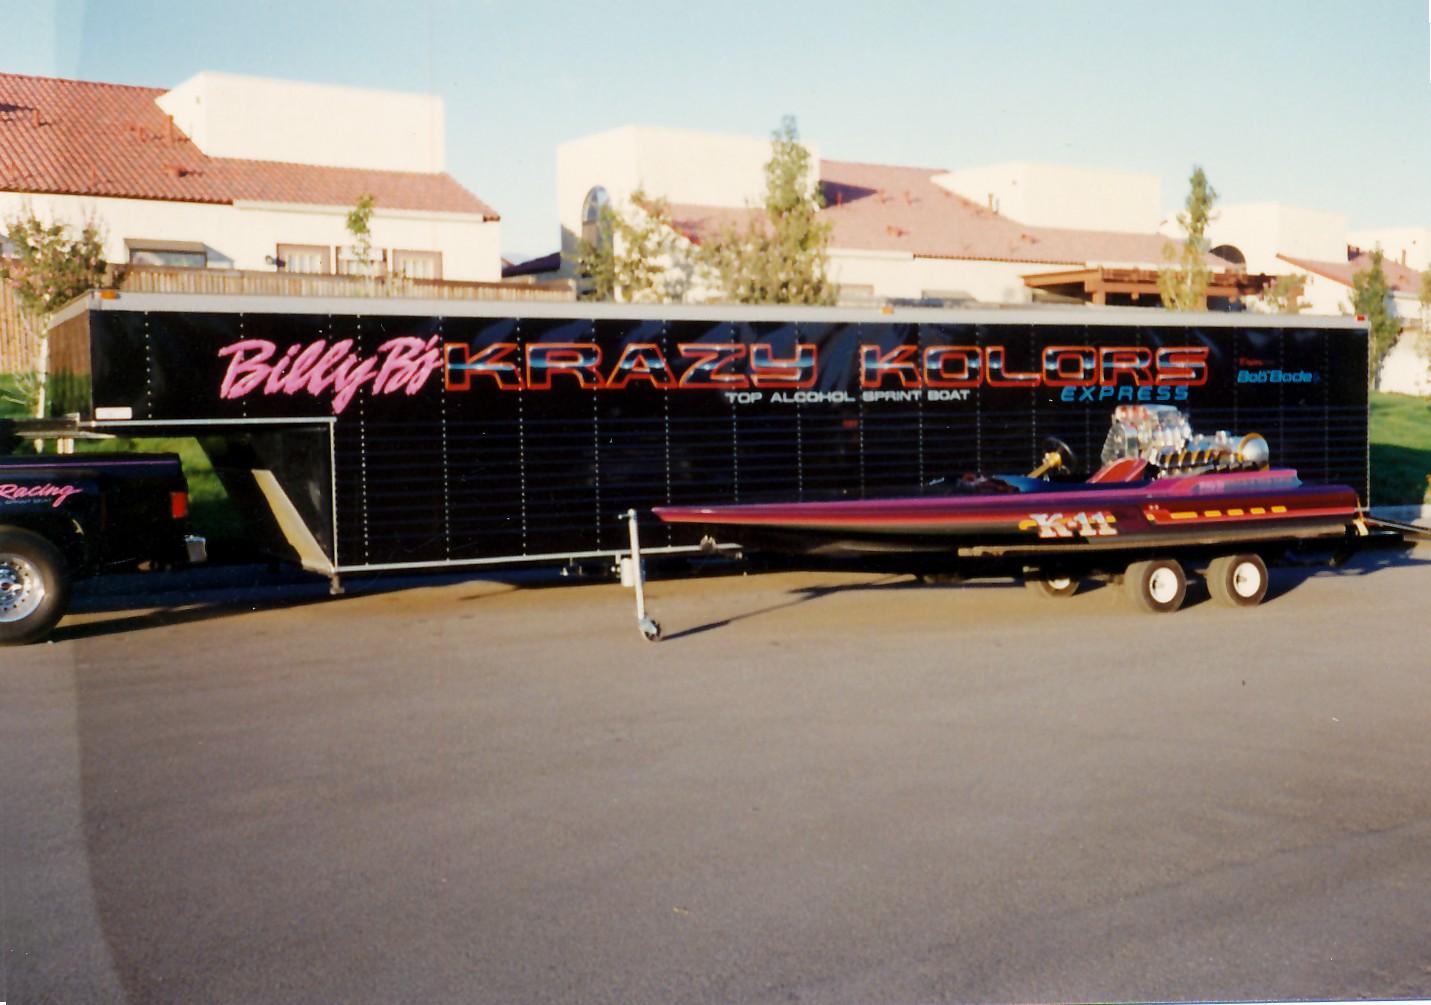 BillyB K Boat-Trailer mage.jpg